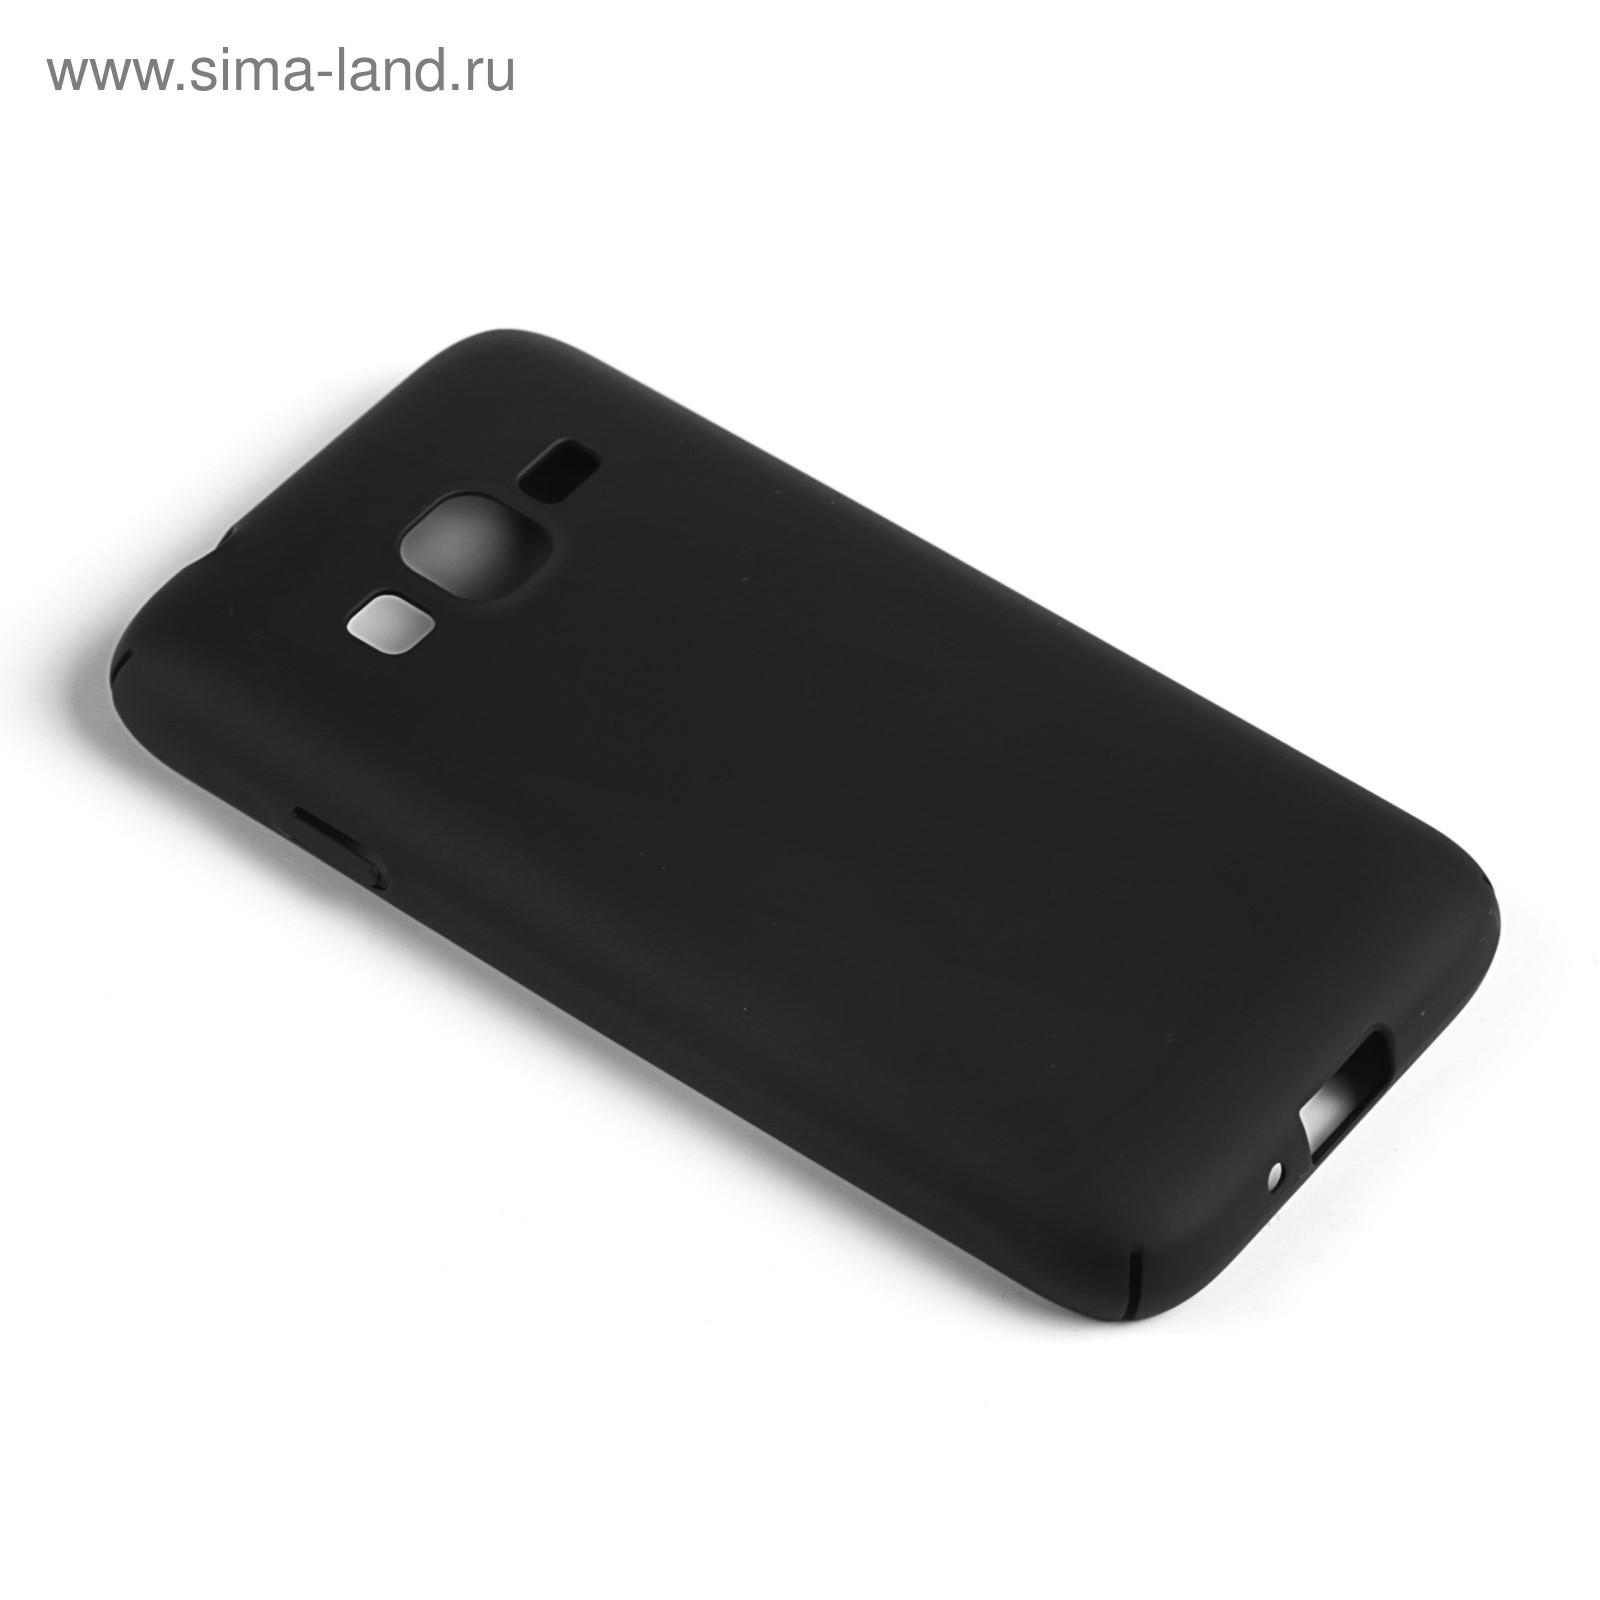 a2413860cff99 Накладка Caseguru Samsung Galaxy J1 mini Prime Soft-Touch (3325233 ...